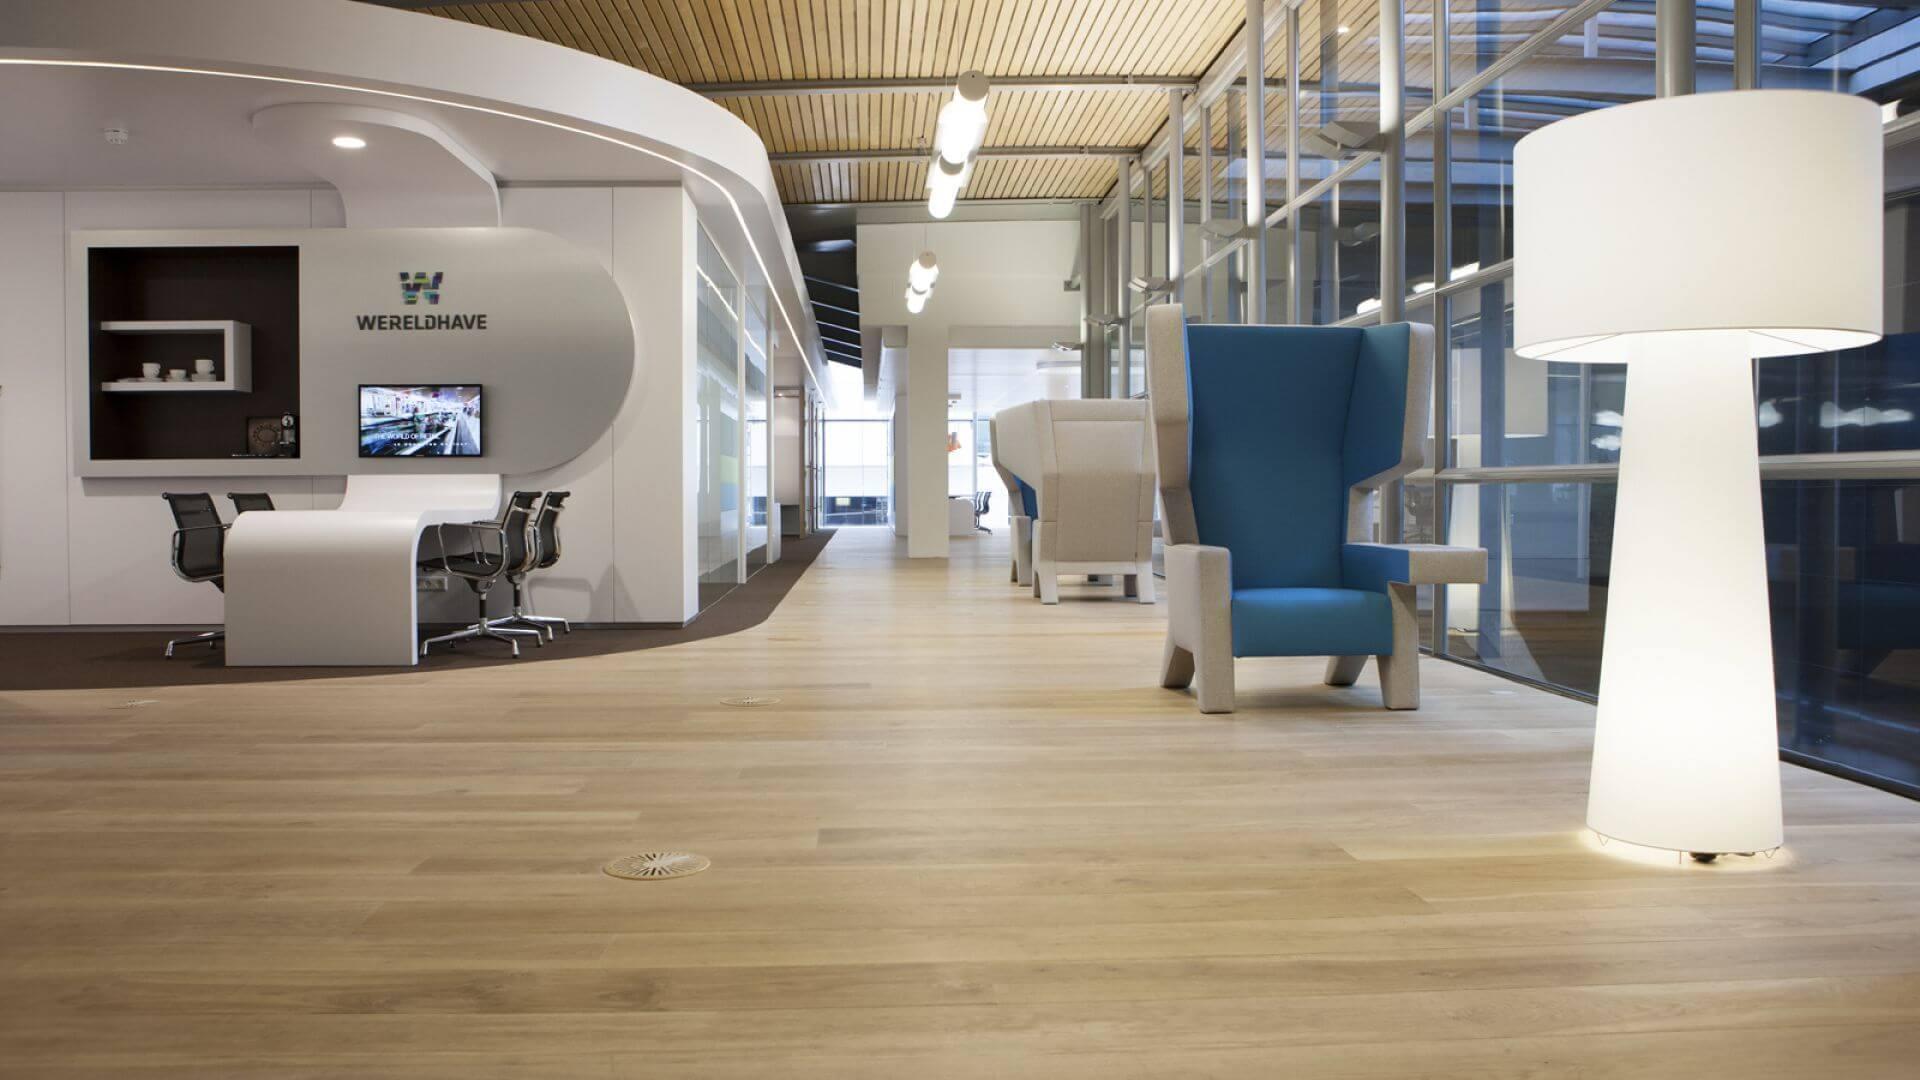 oak wood office floor schiphol wtc the netherlands